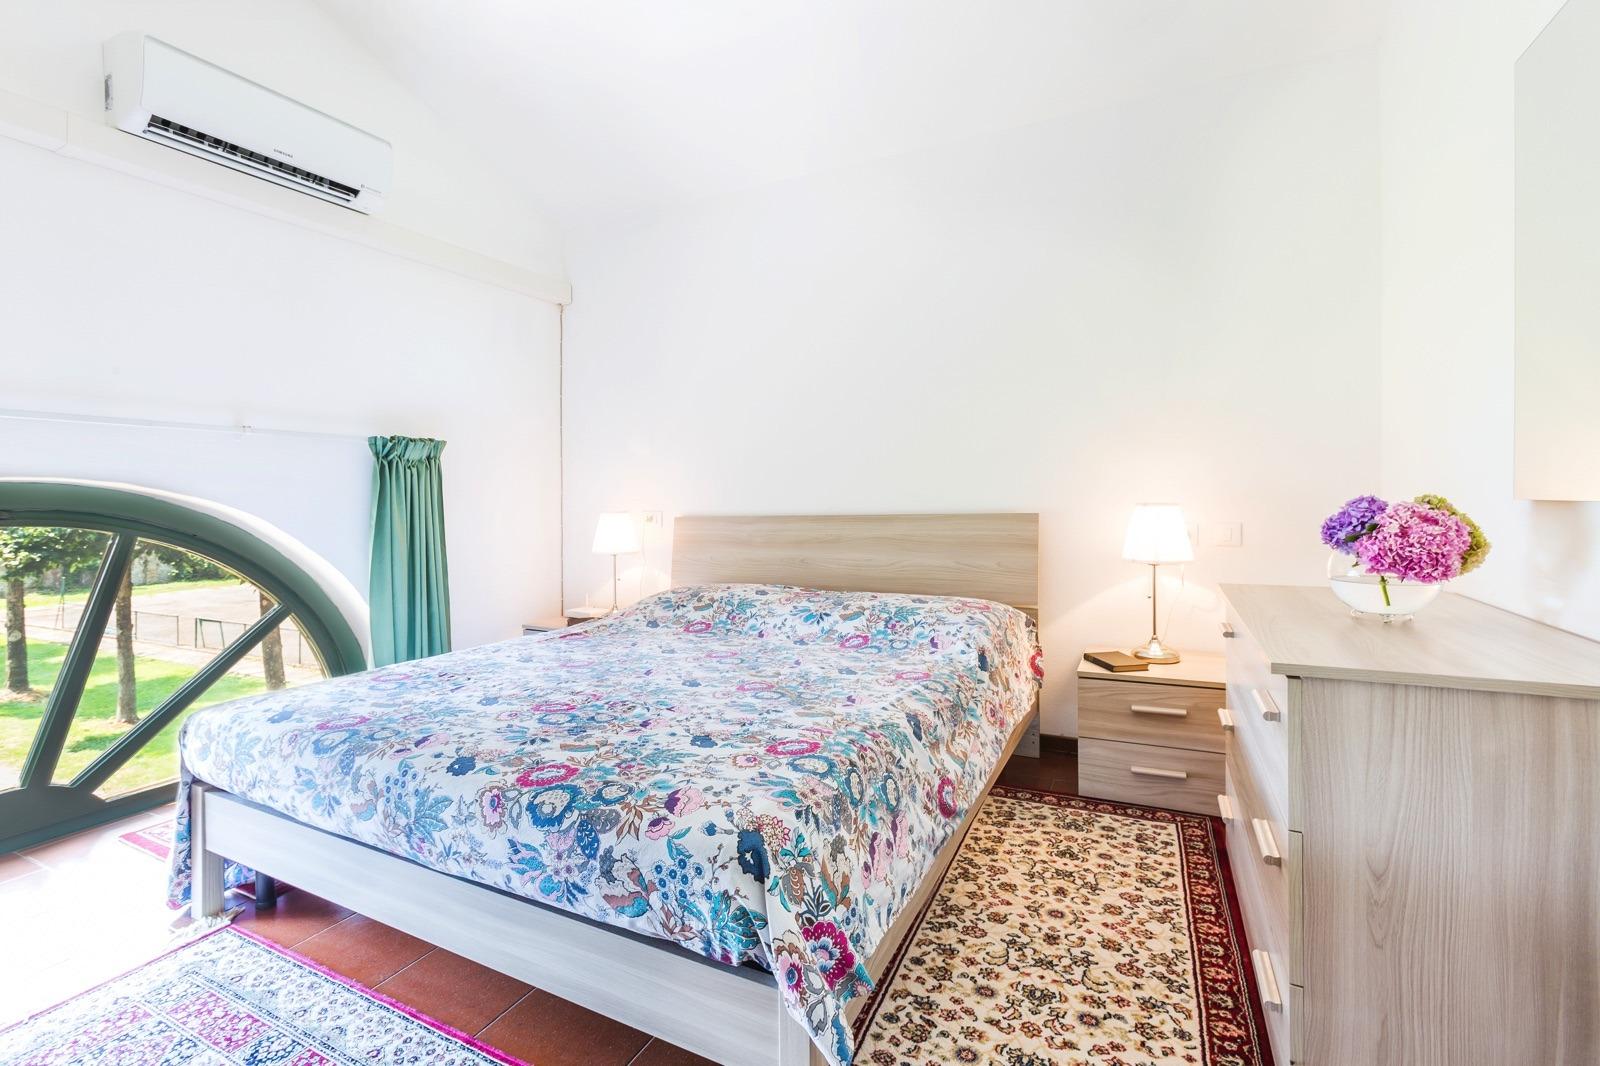 Appartamenti-004-Resized